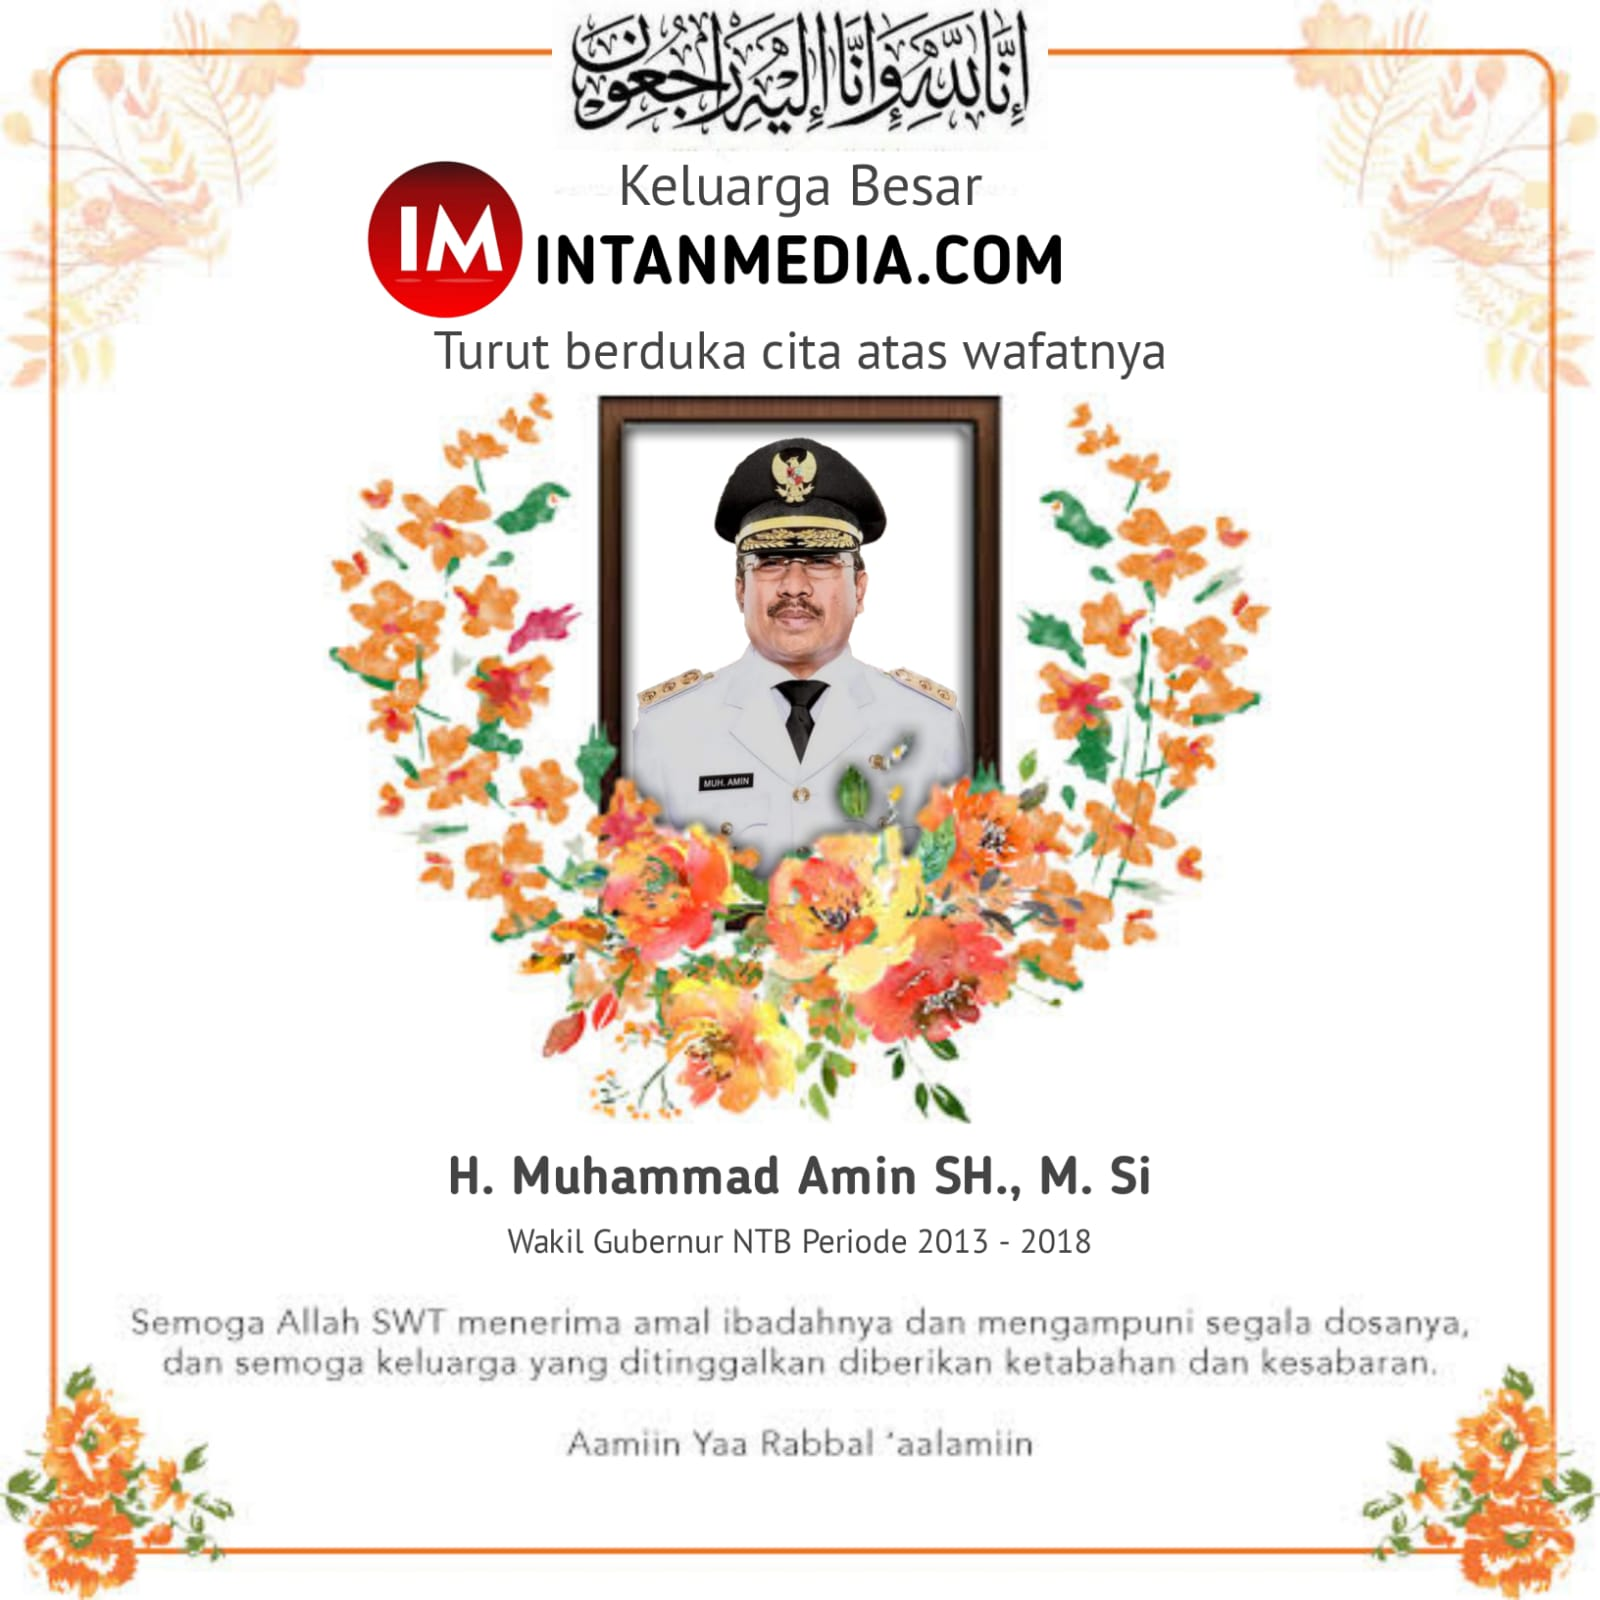 Ucapan duka Cita keluarga besar Redaksi intanmedia.com